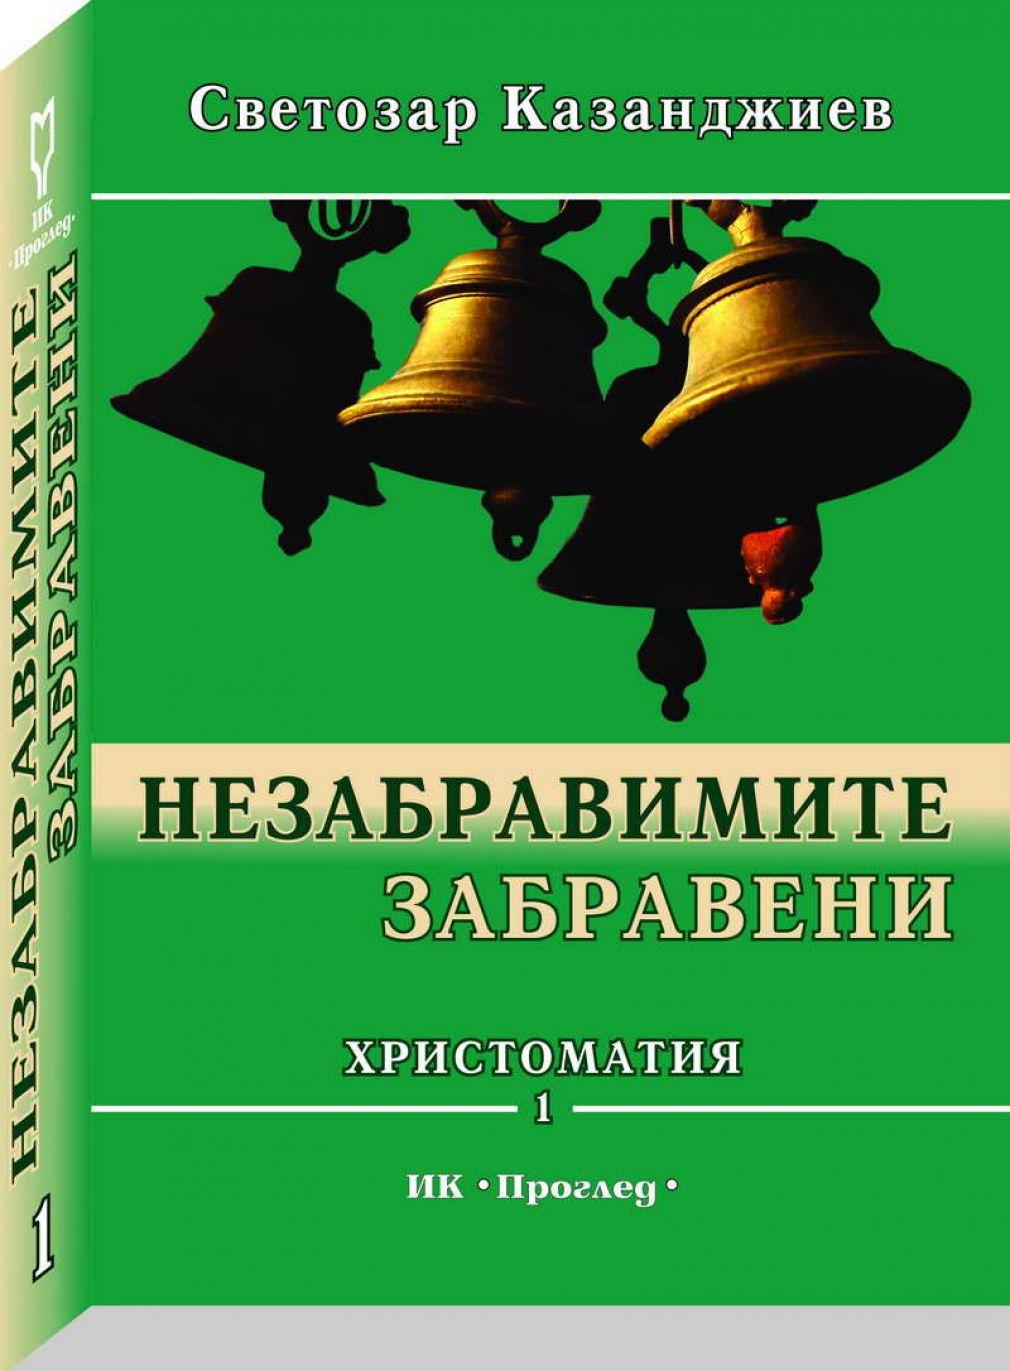 """Незабравимите забравени"", том първи, Изд. ""Проглед"", 2019 г."